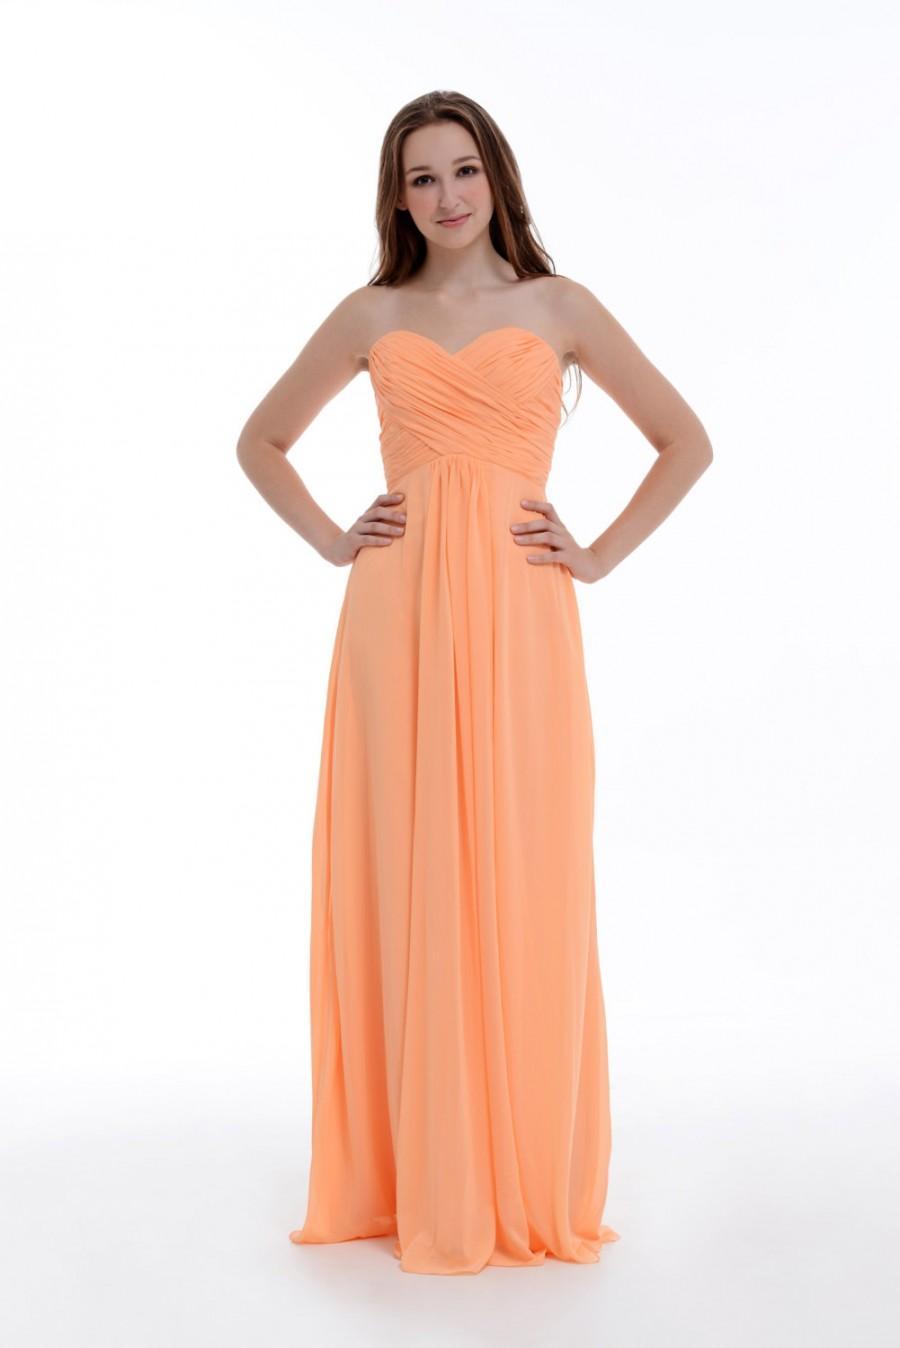 Mariage - Peach Bridesmaid Dress, Empire Sweetheart Floor-Length Chiffon Bridesmaid Dress/Homecoming Dress/Prom Dress With Ruffle